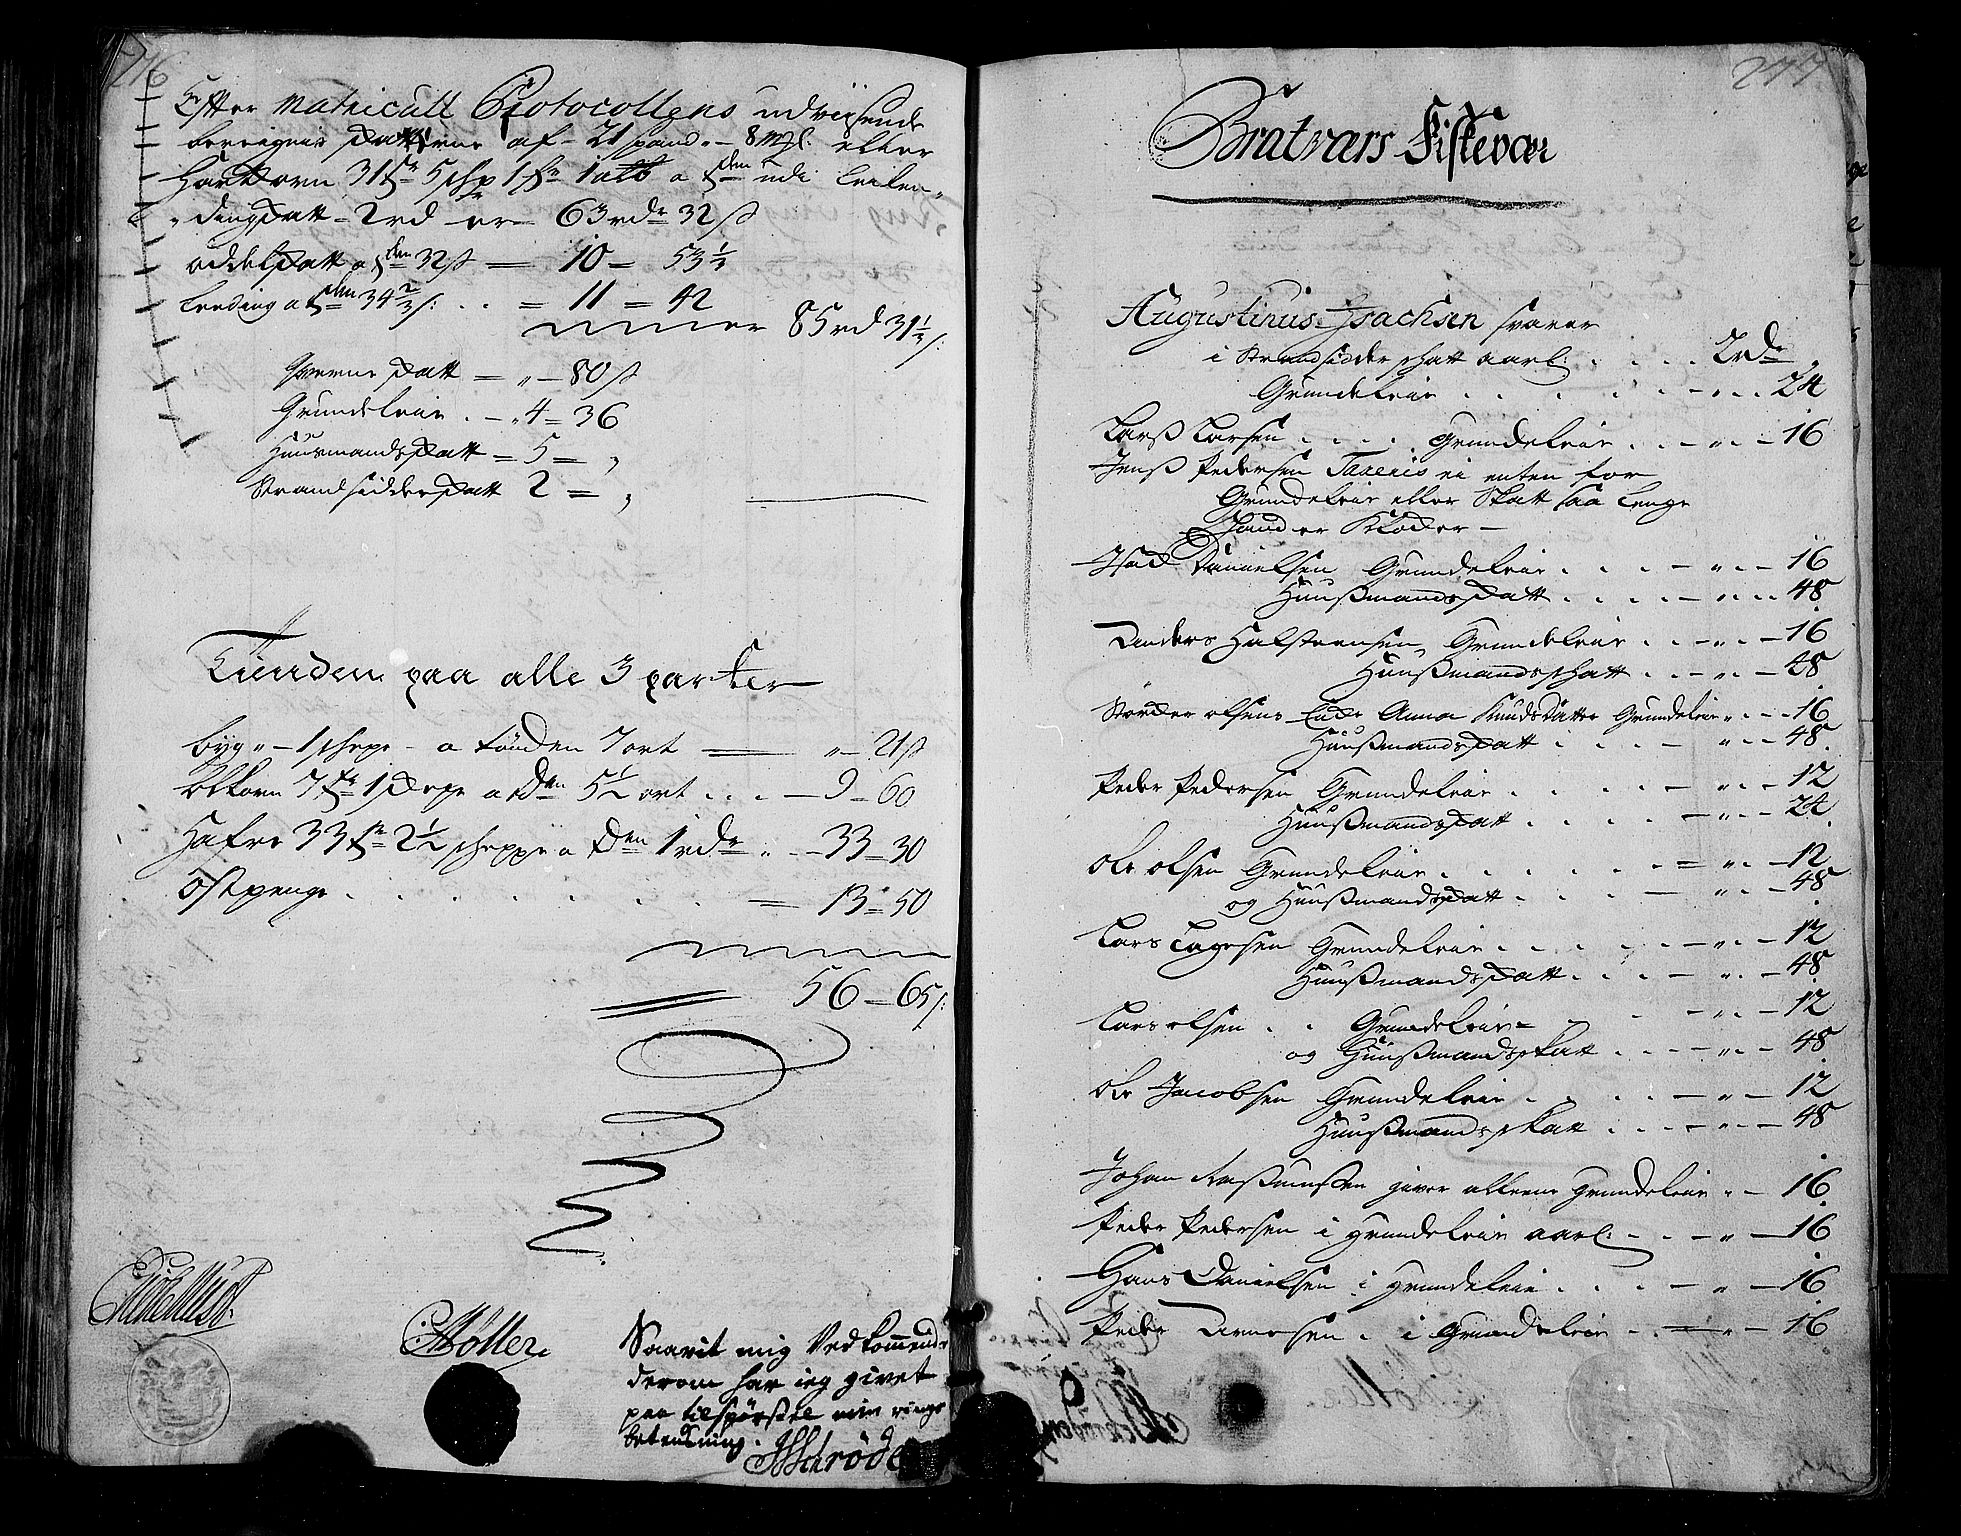 RA, Rentekammeret inntil 1814, Realistisk ordnet avdeling, N/Nb/Nbf/L0155: Nordmøre matrikkelprotokoll, 1721-1723, s. 276-277